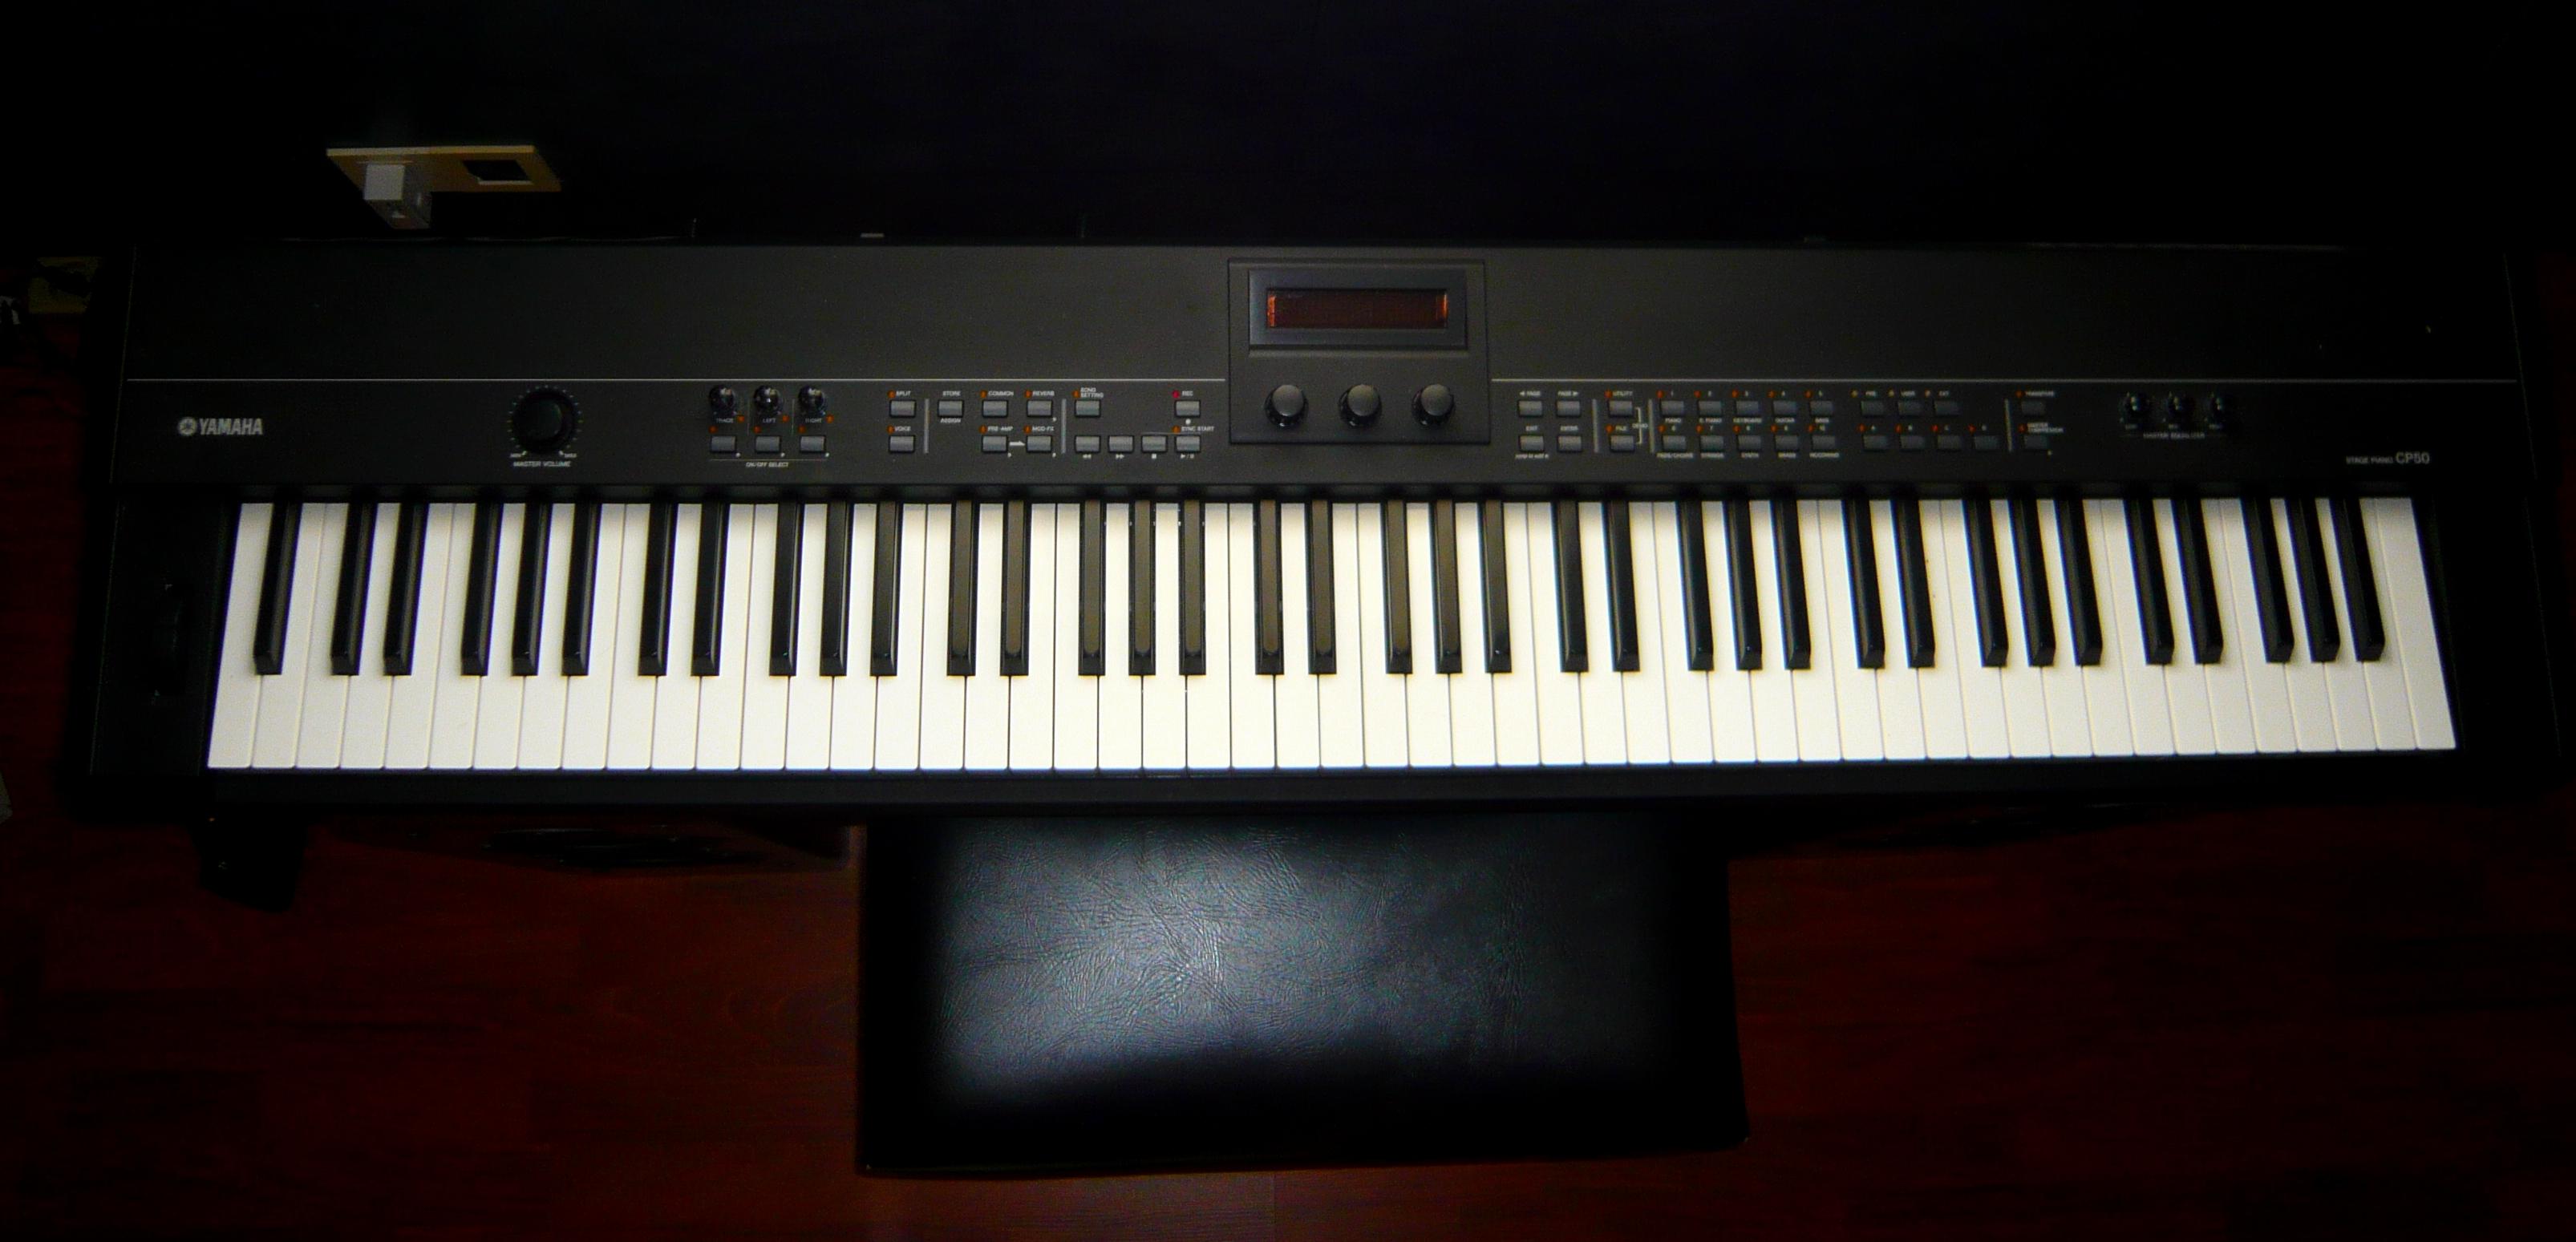 Yamaha cp50 image 459451 audiofanzine for Yamaha cp50 review